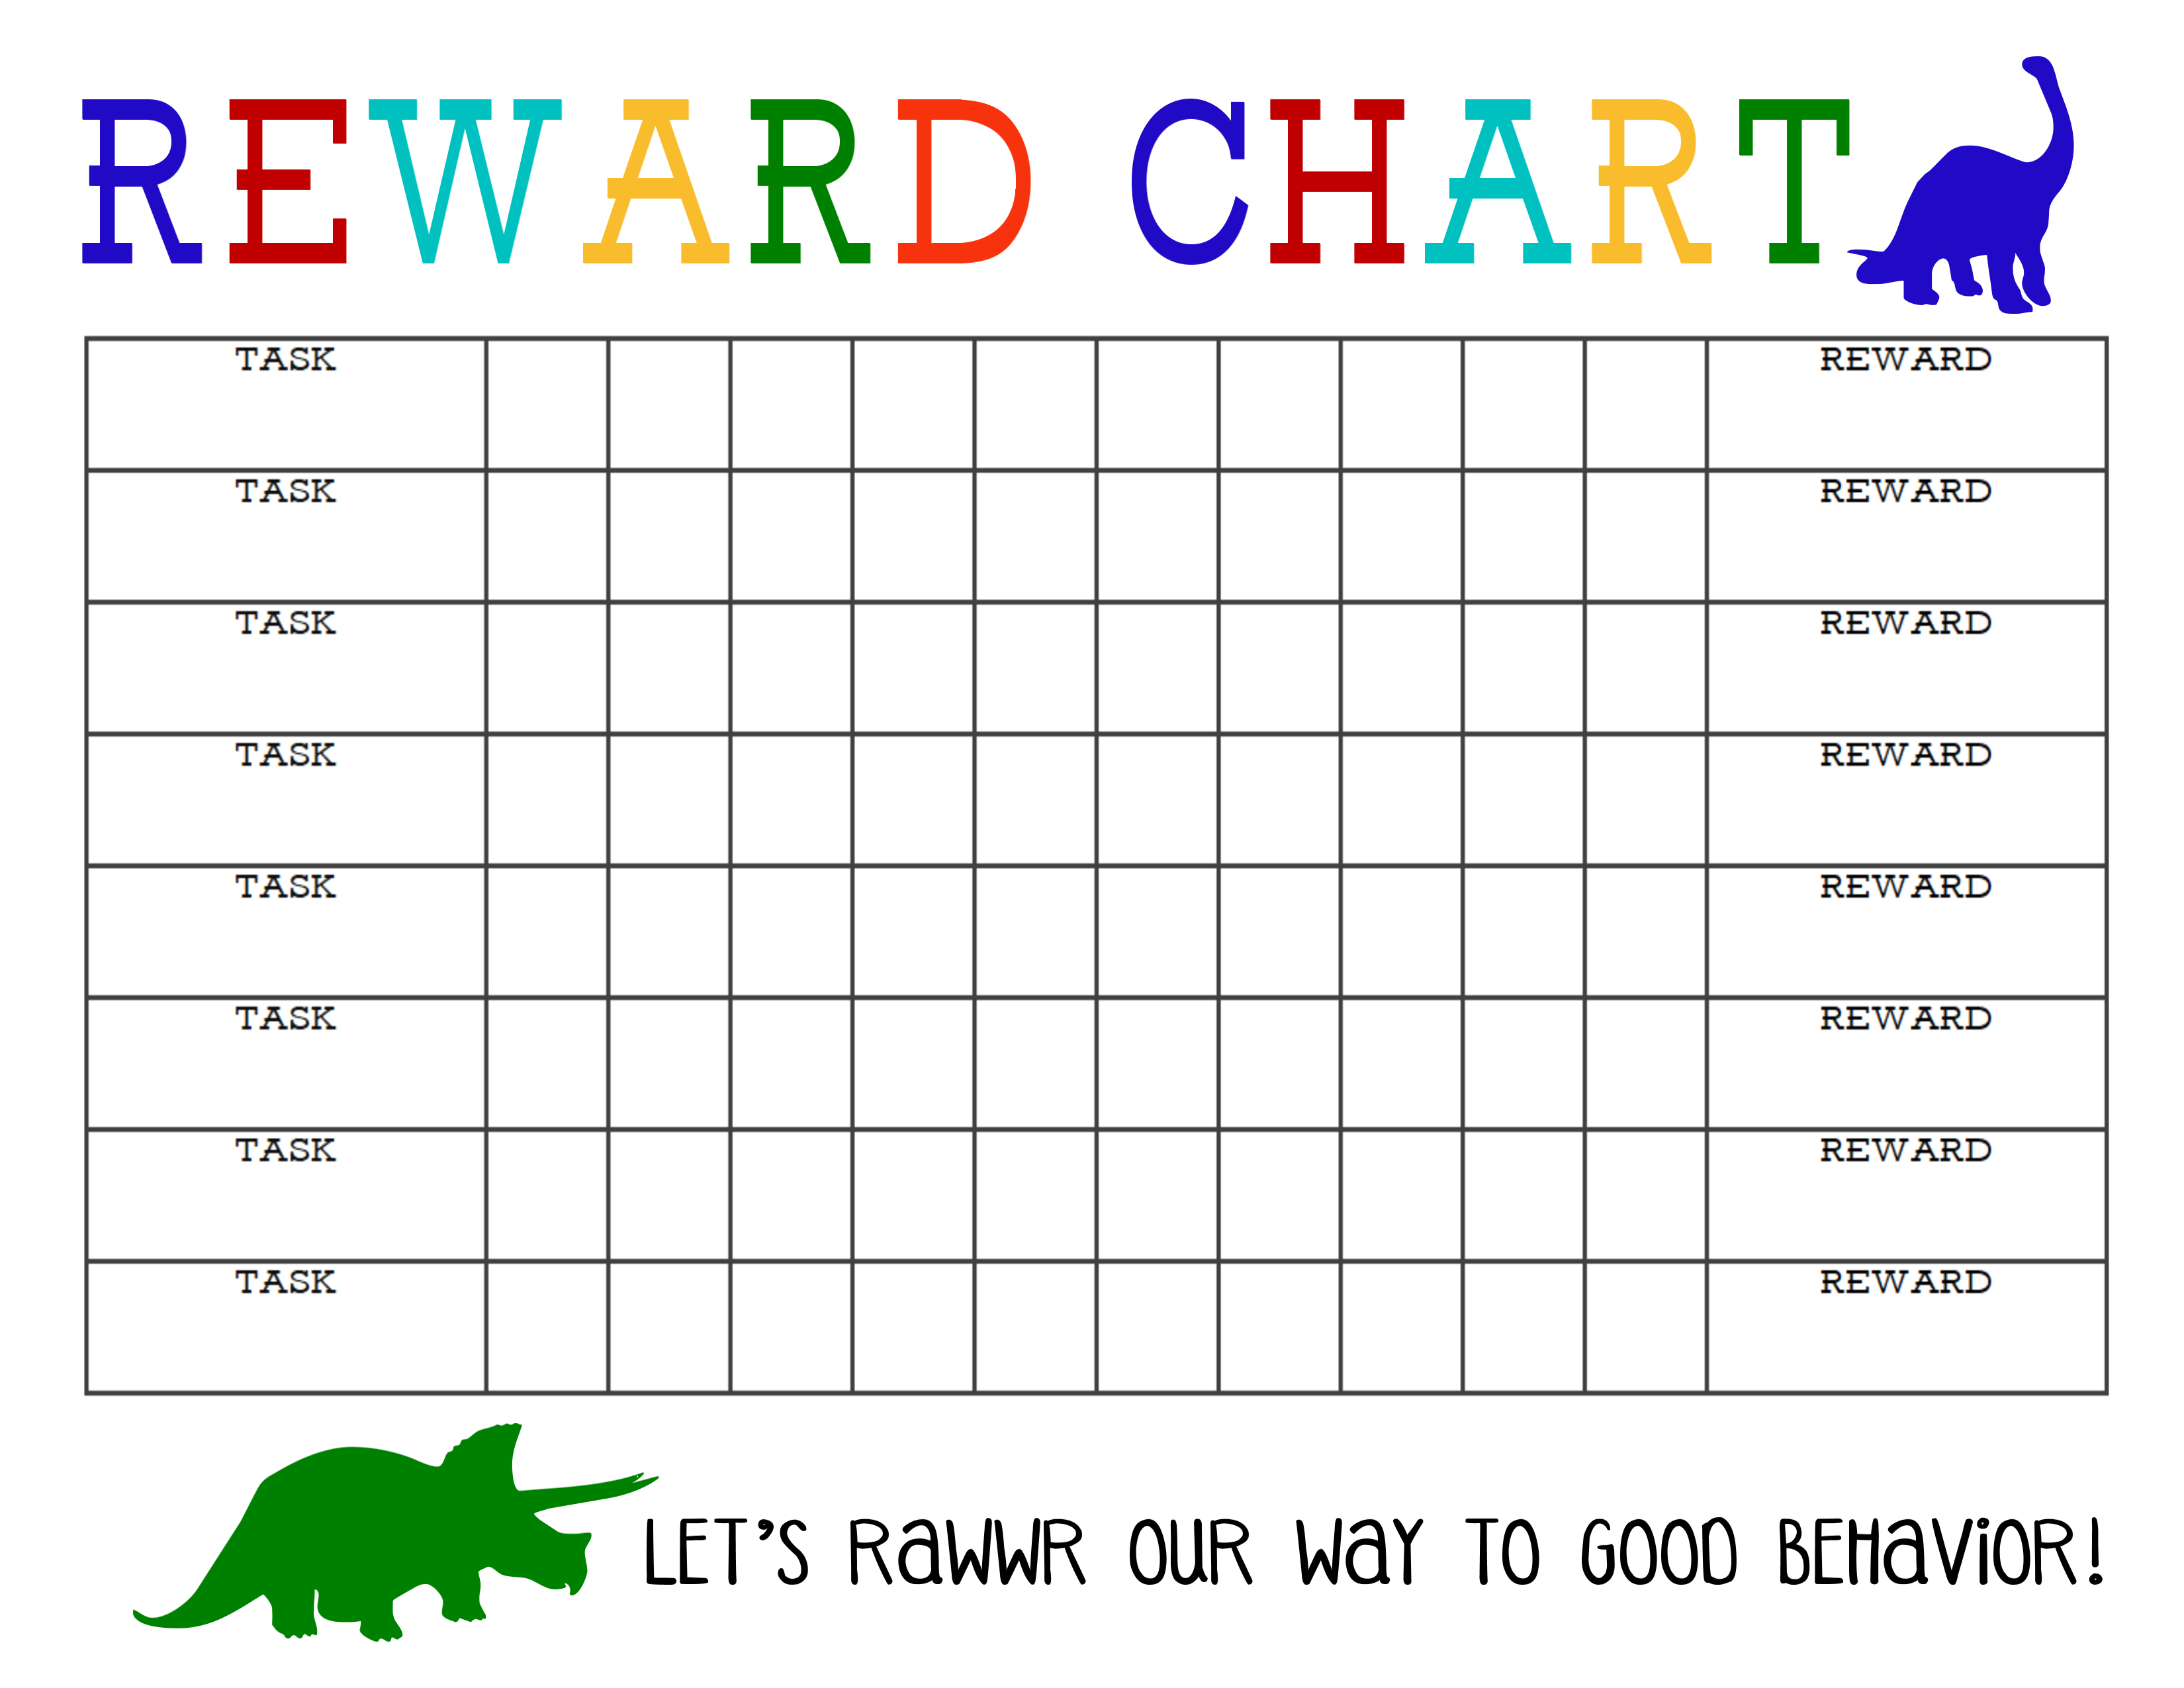 Printable Reward Chart - The Girl Creative - Reward Charts For Toddlers Free Printable